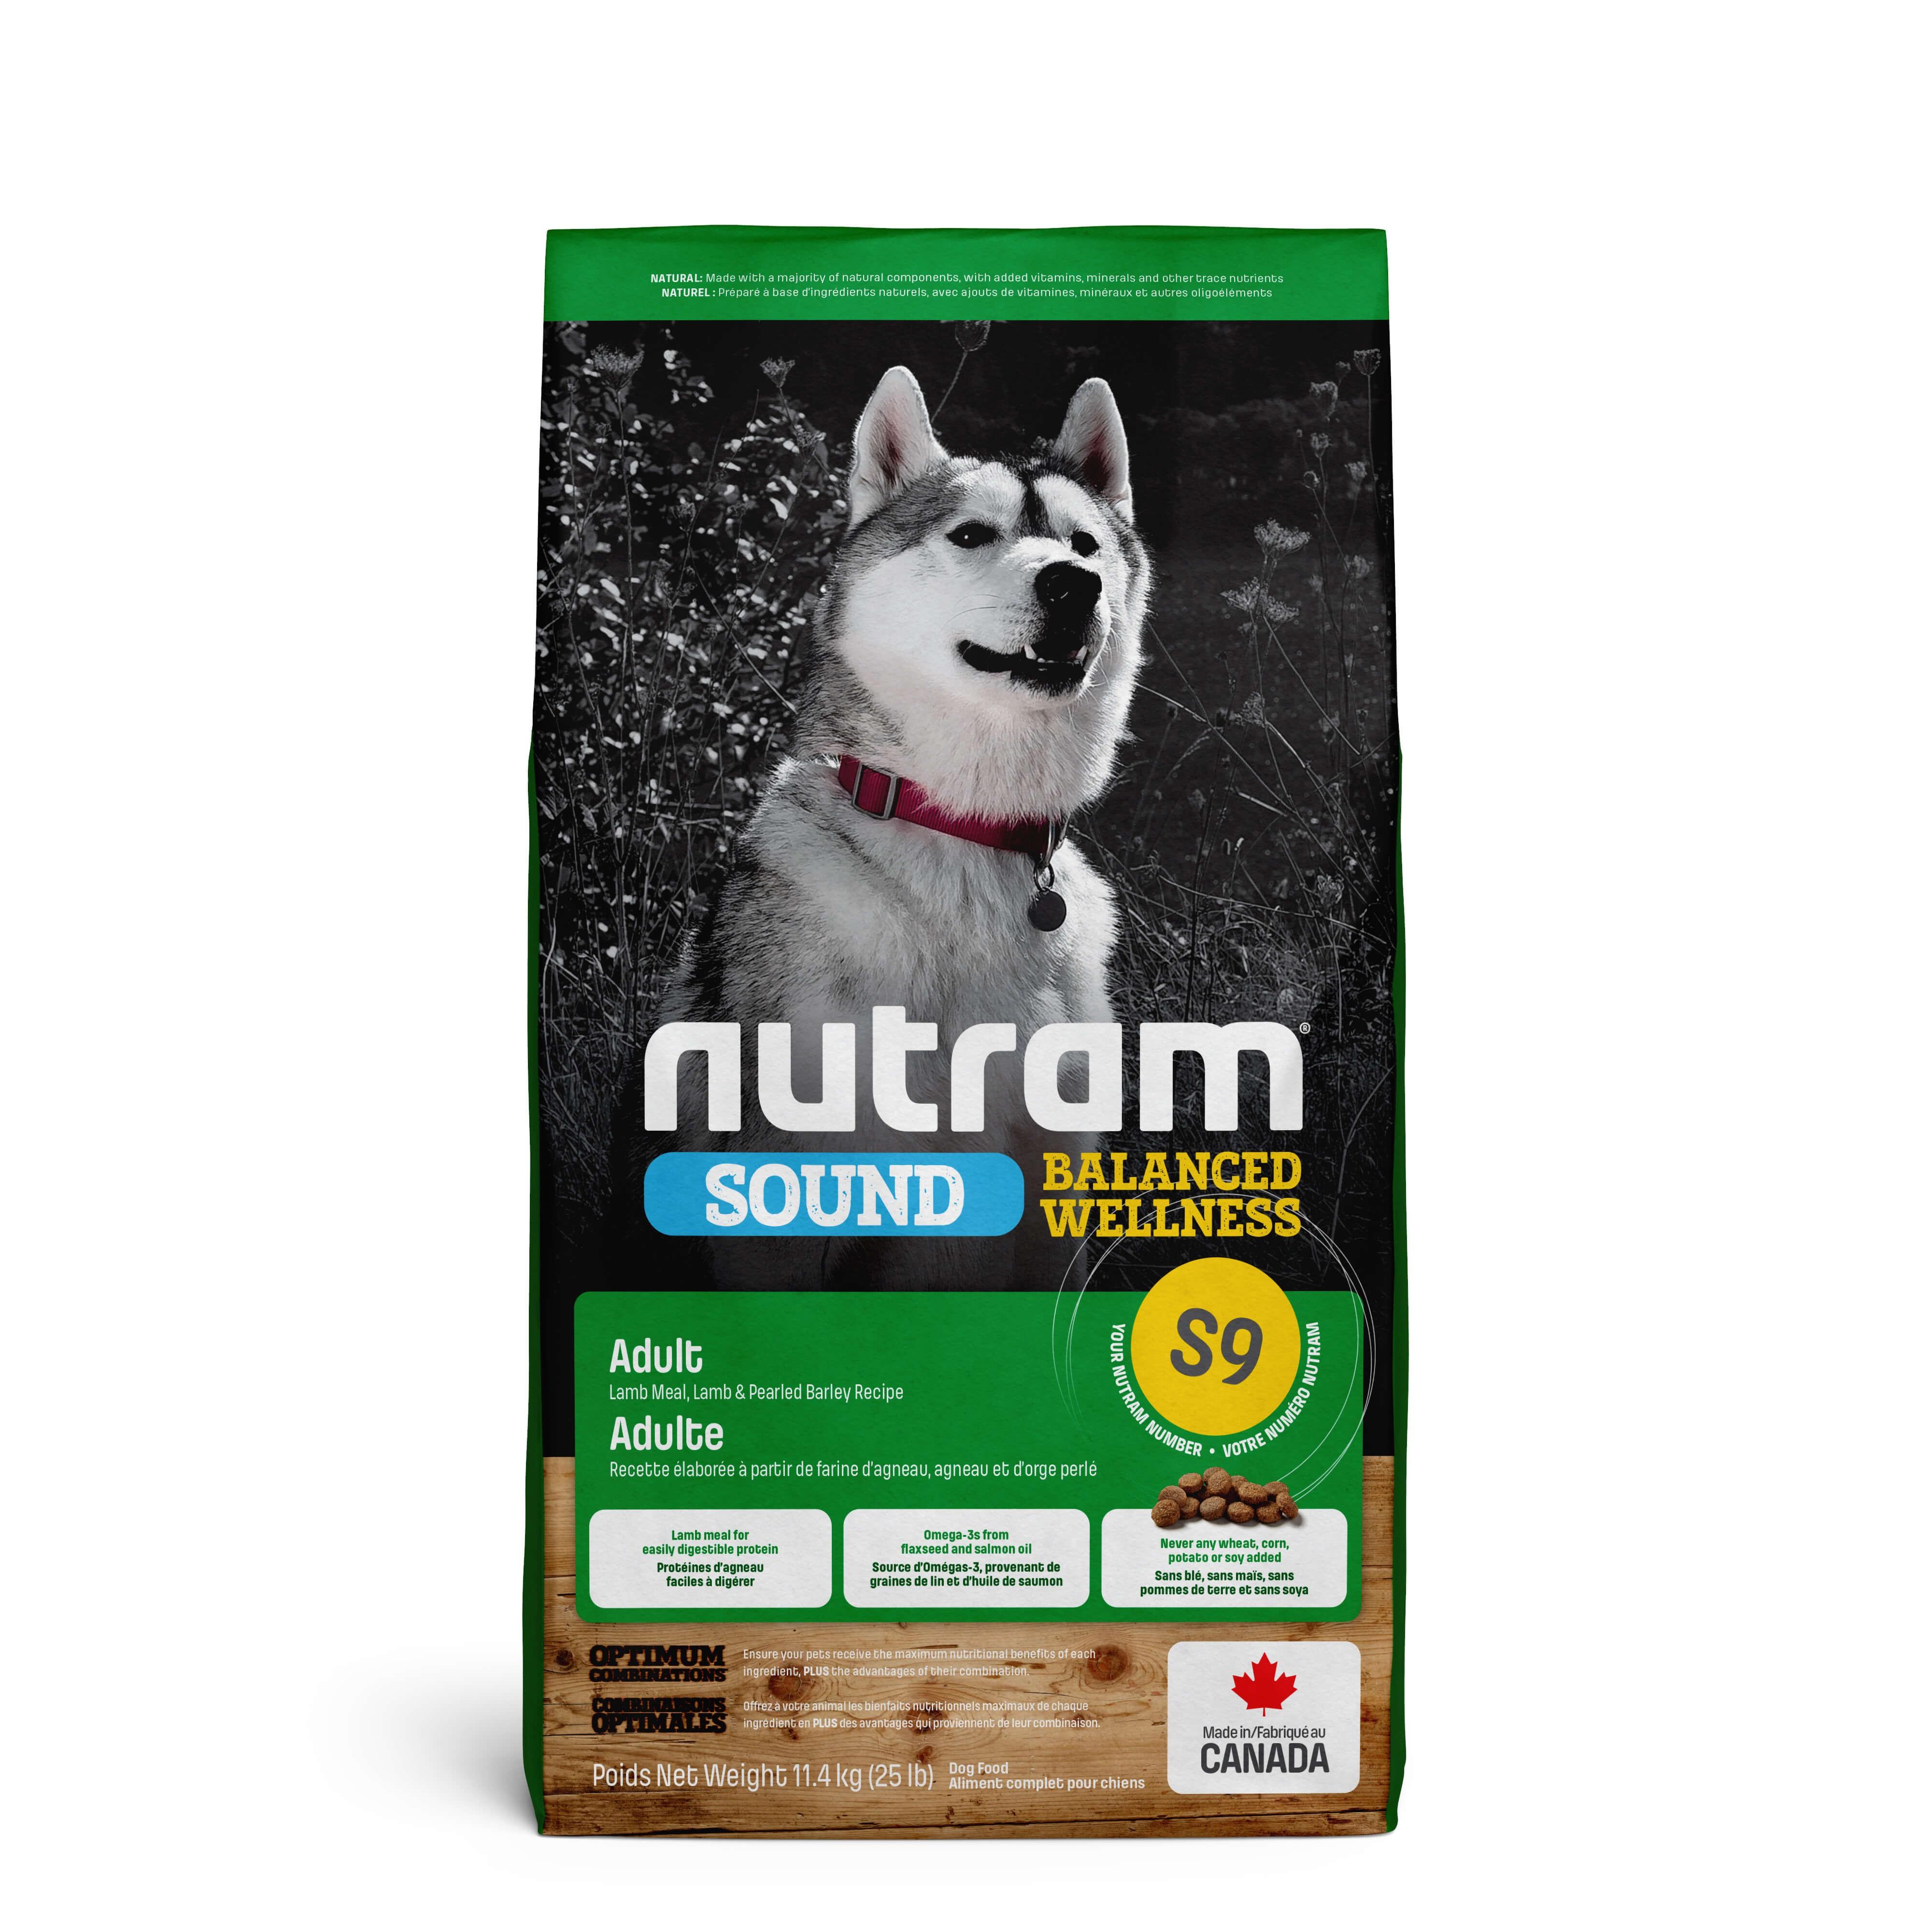 Nutram Sound Balanced Wellness Adult Lam S9 hond